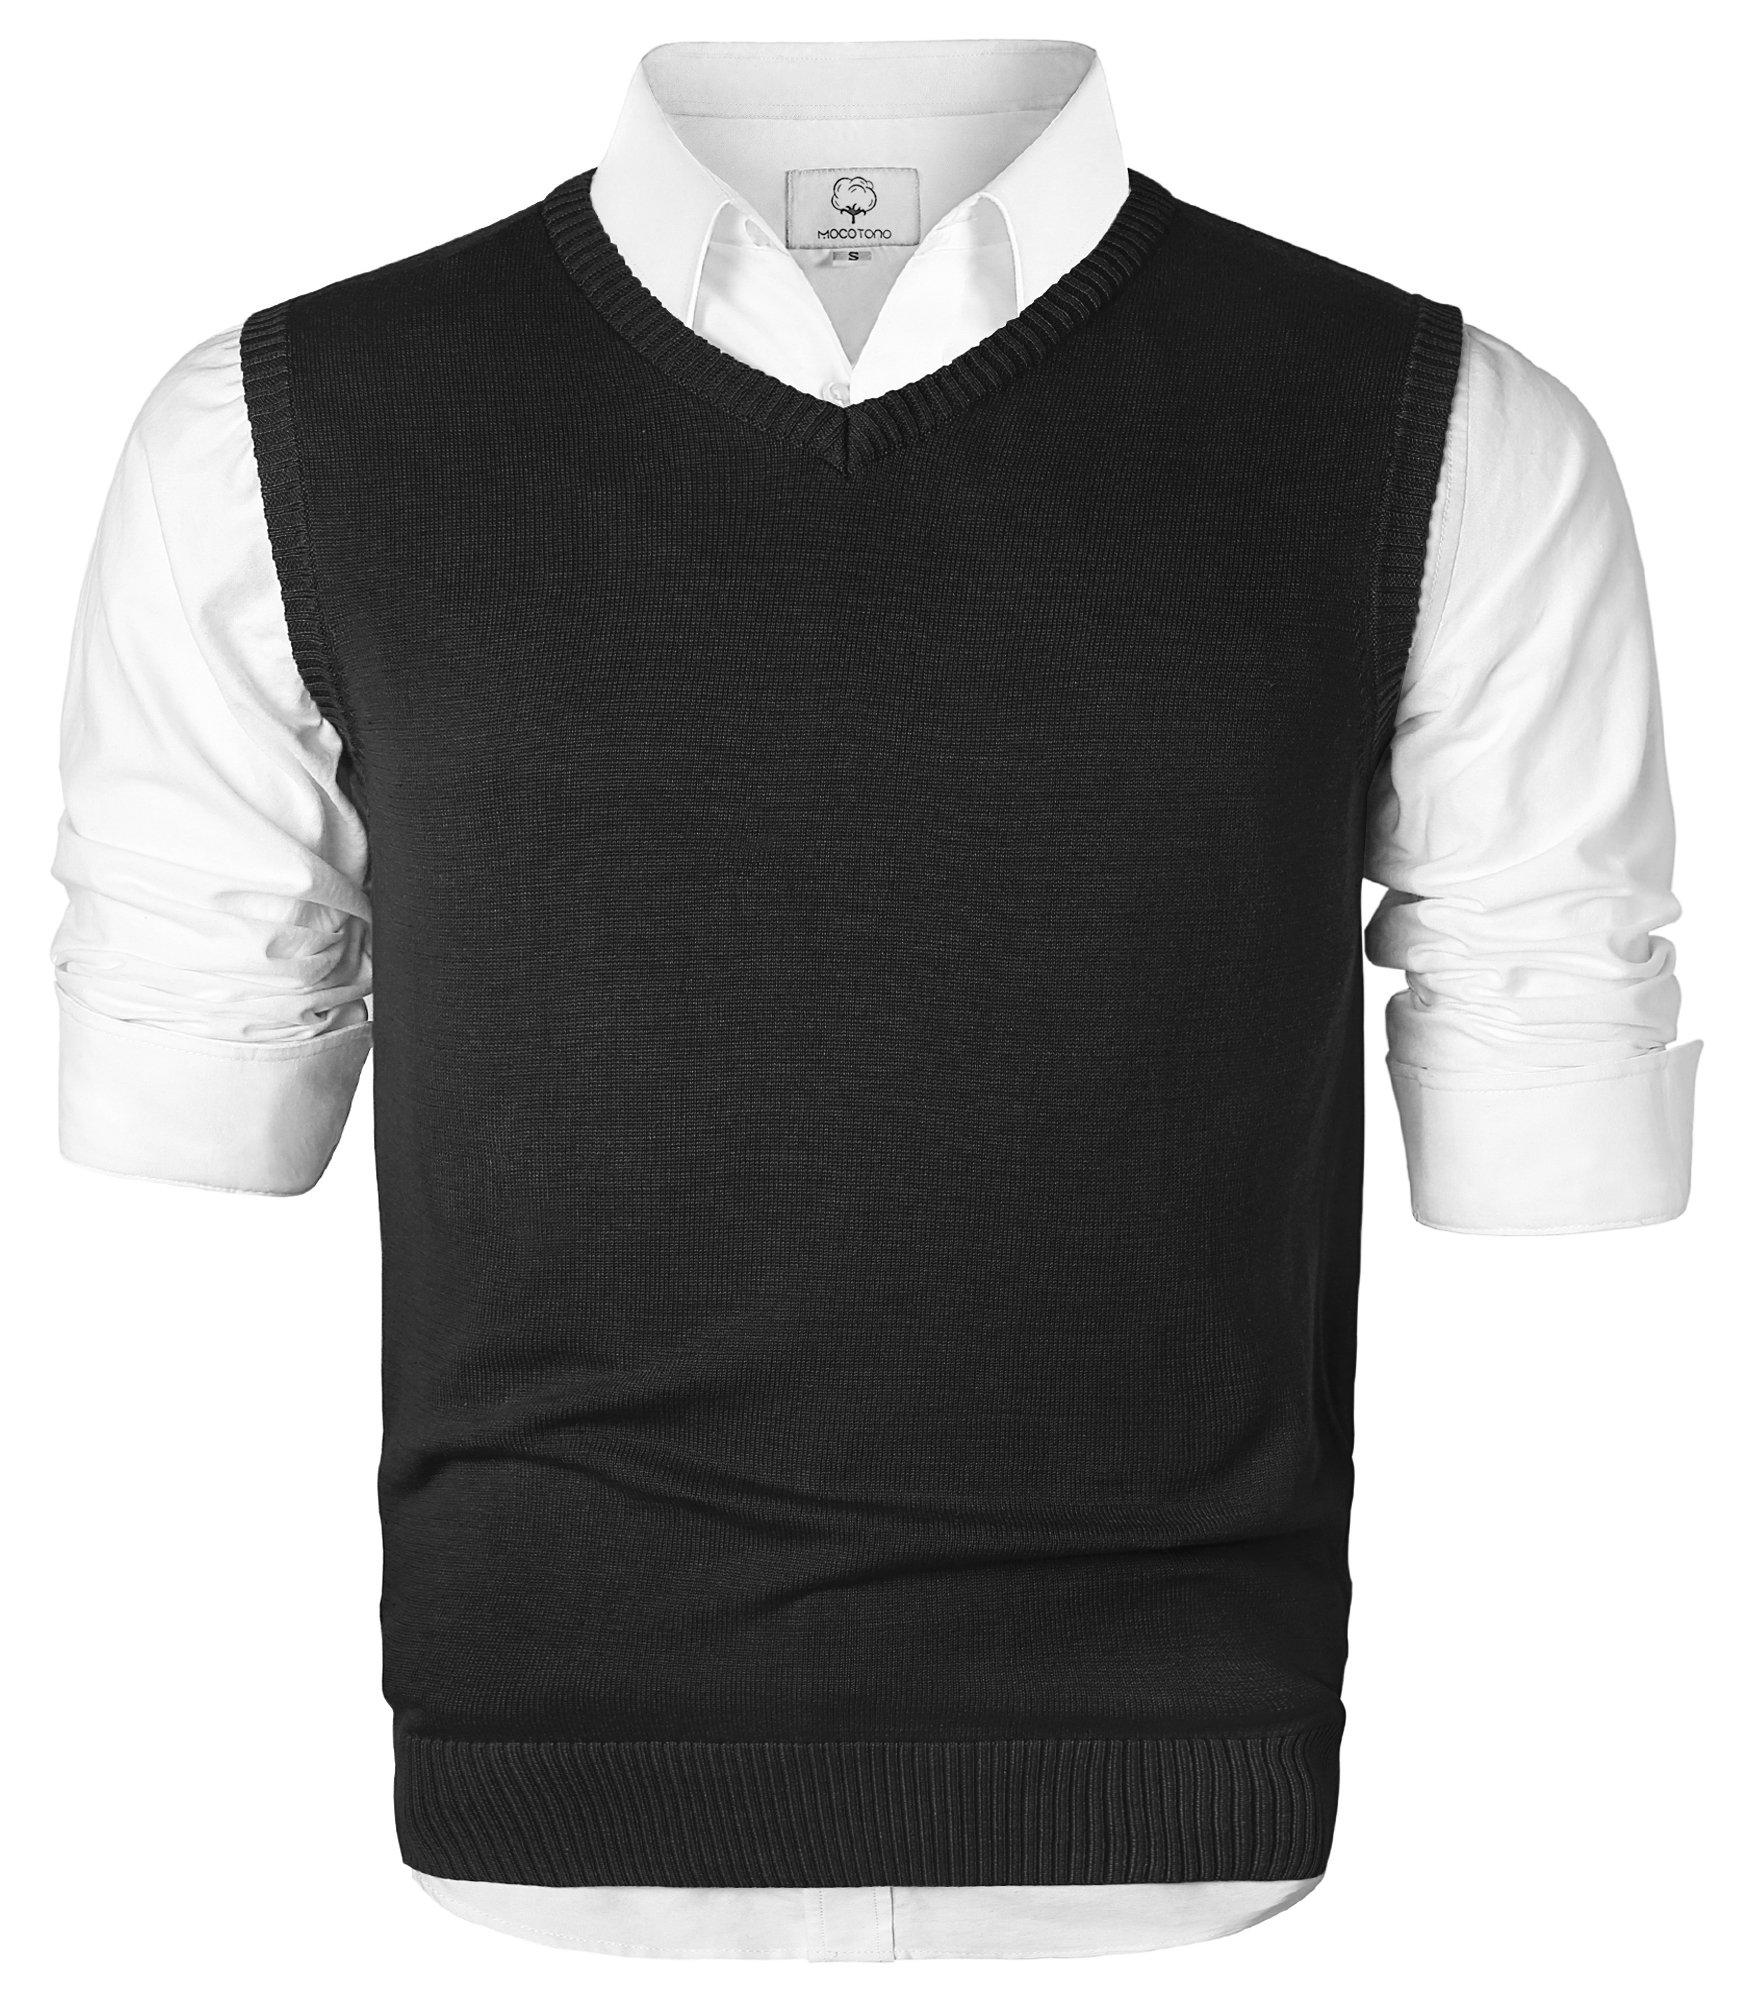 MOCOTONO Men's V-Neck Cotton Sleeveless Sweater Casual Vest Black Medium